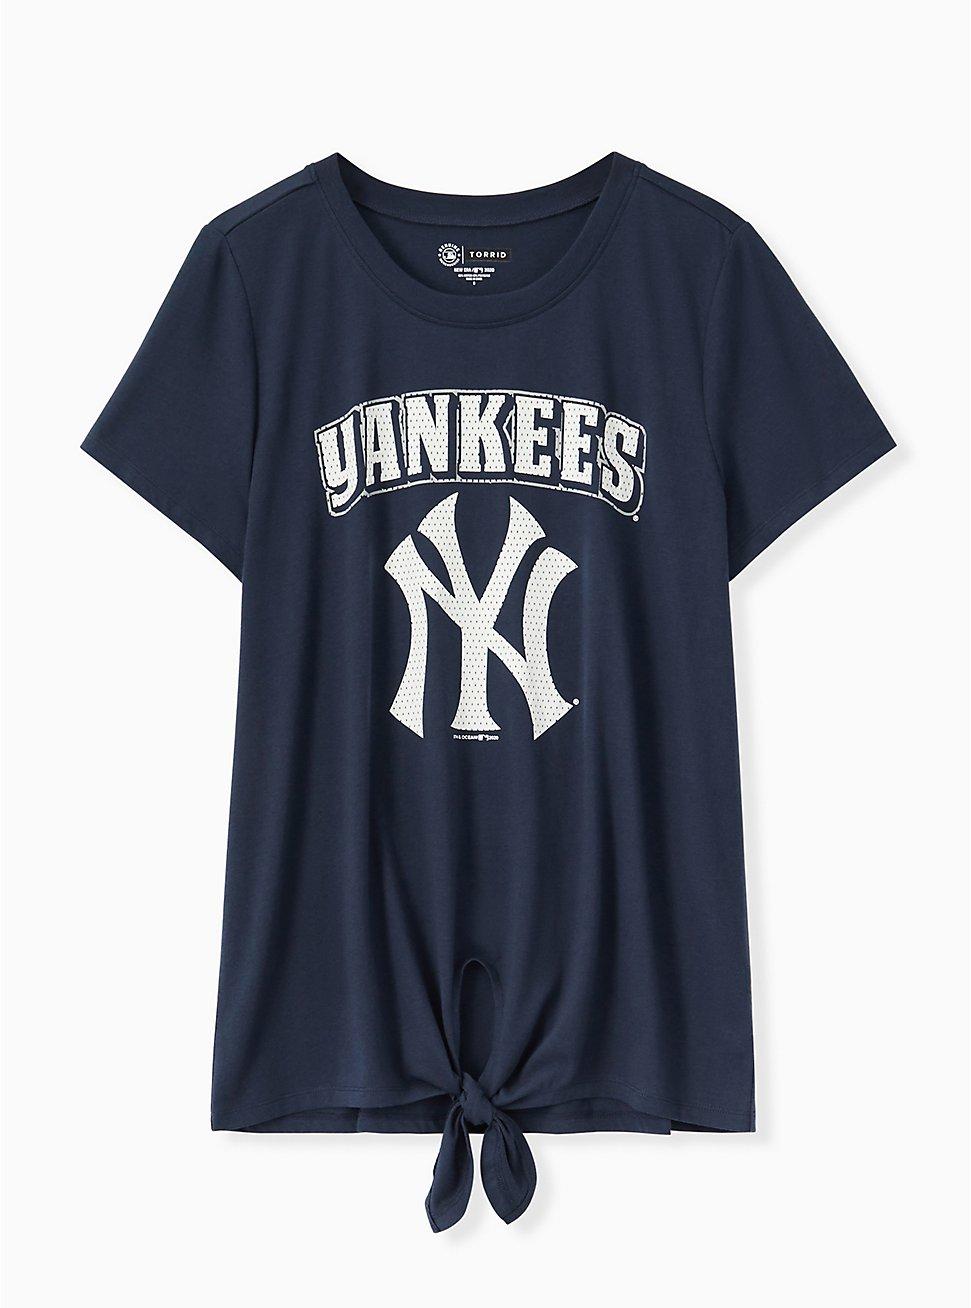 MLB New York Yankees Tie Front Tee - Navy, PEACOAT, hi-res